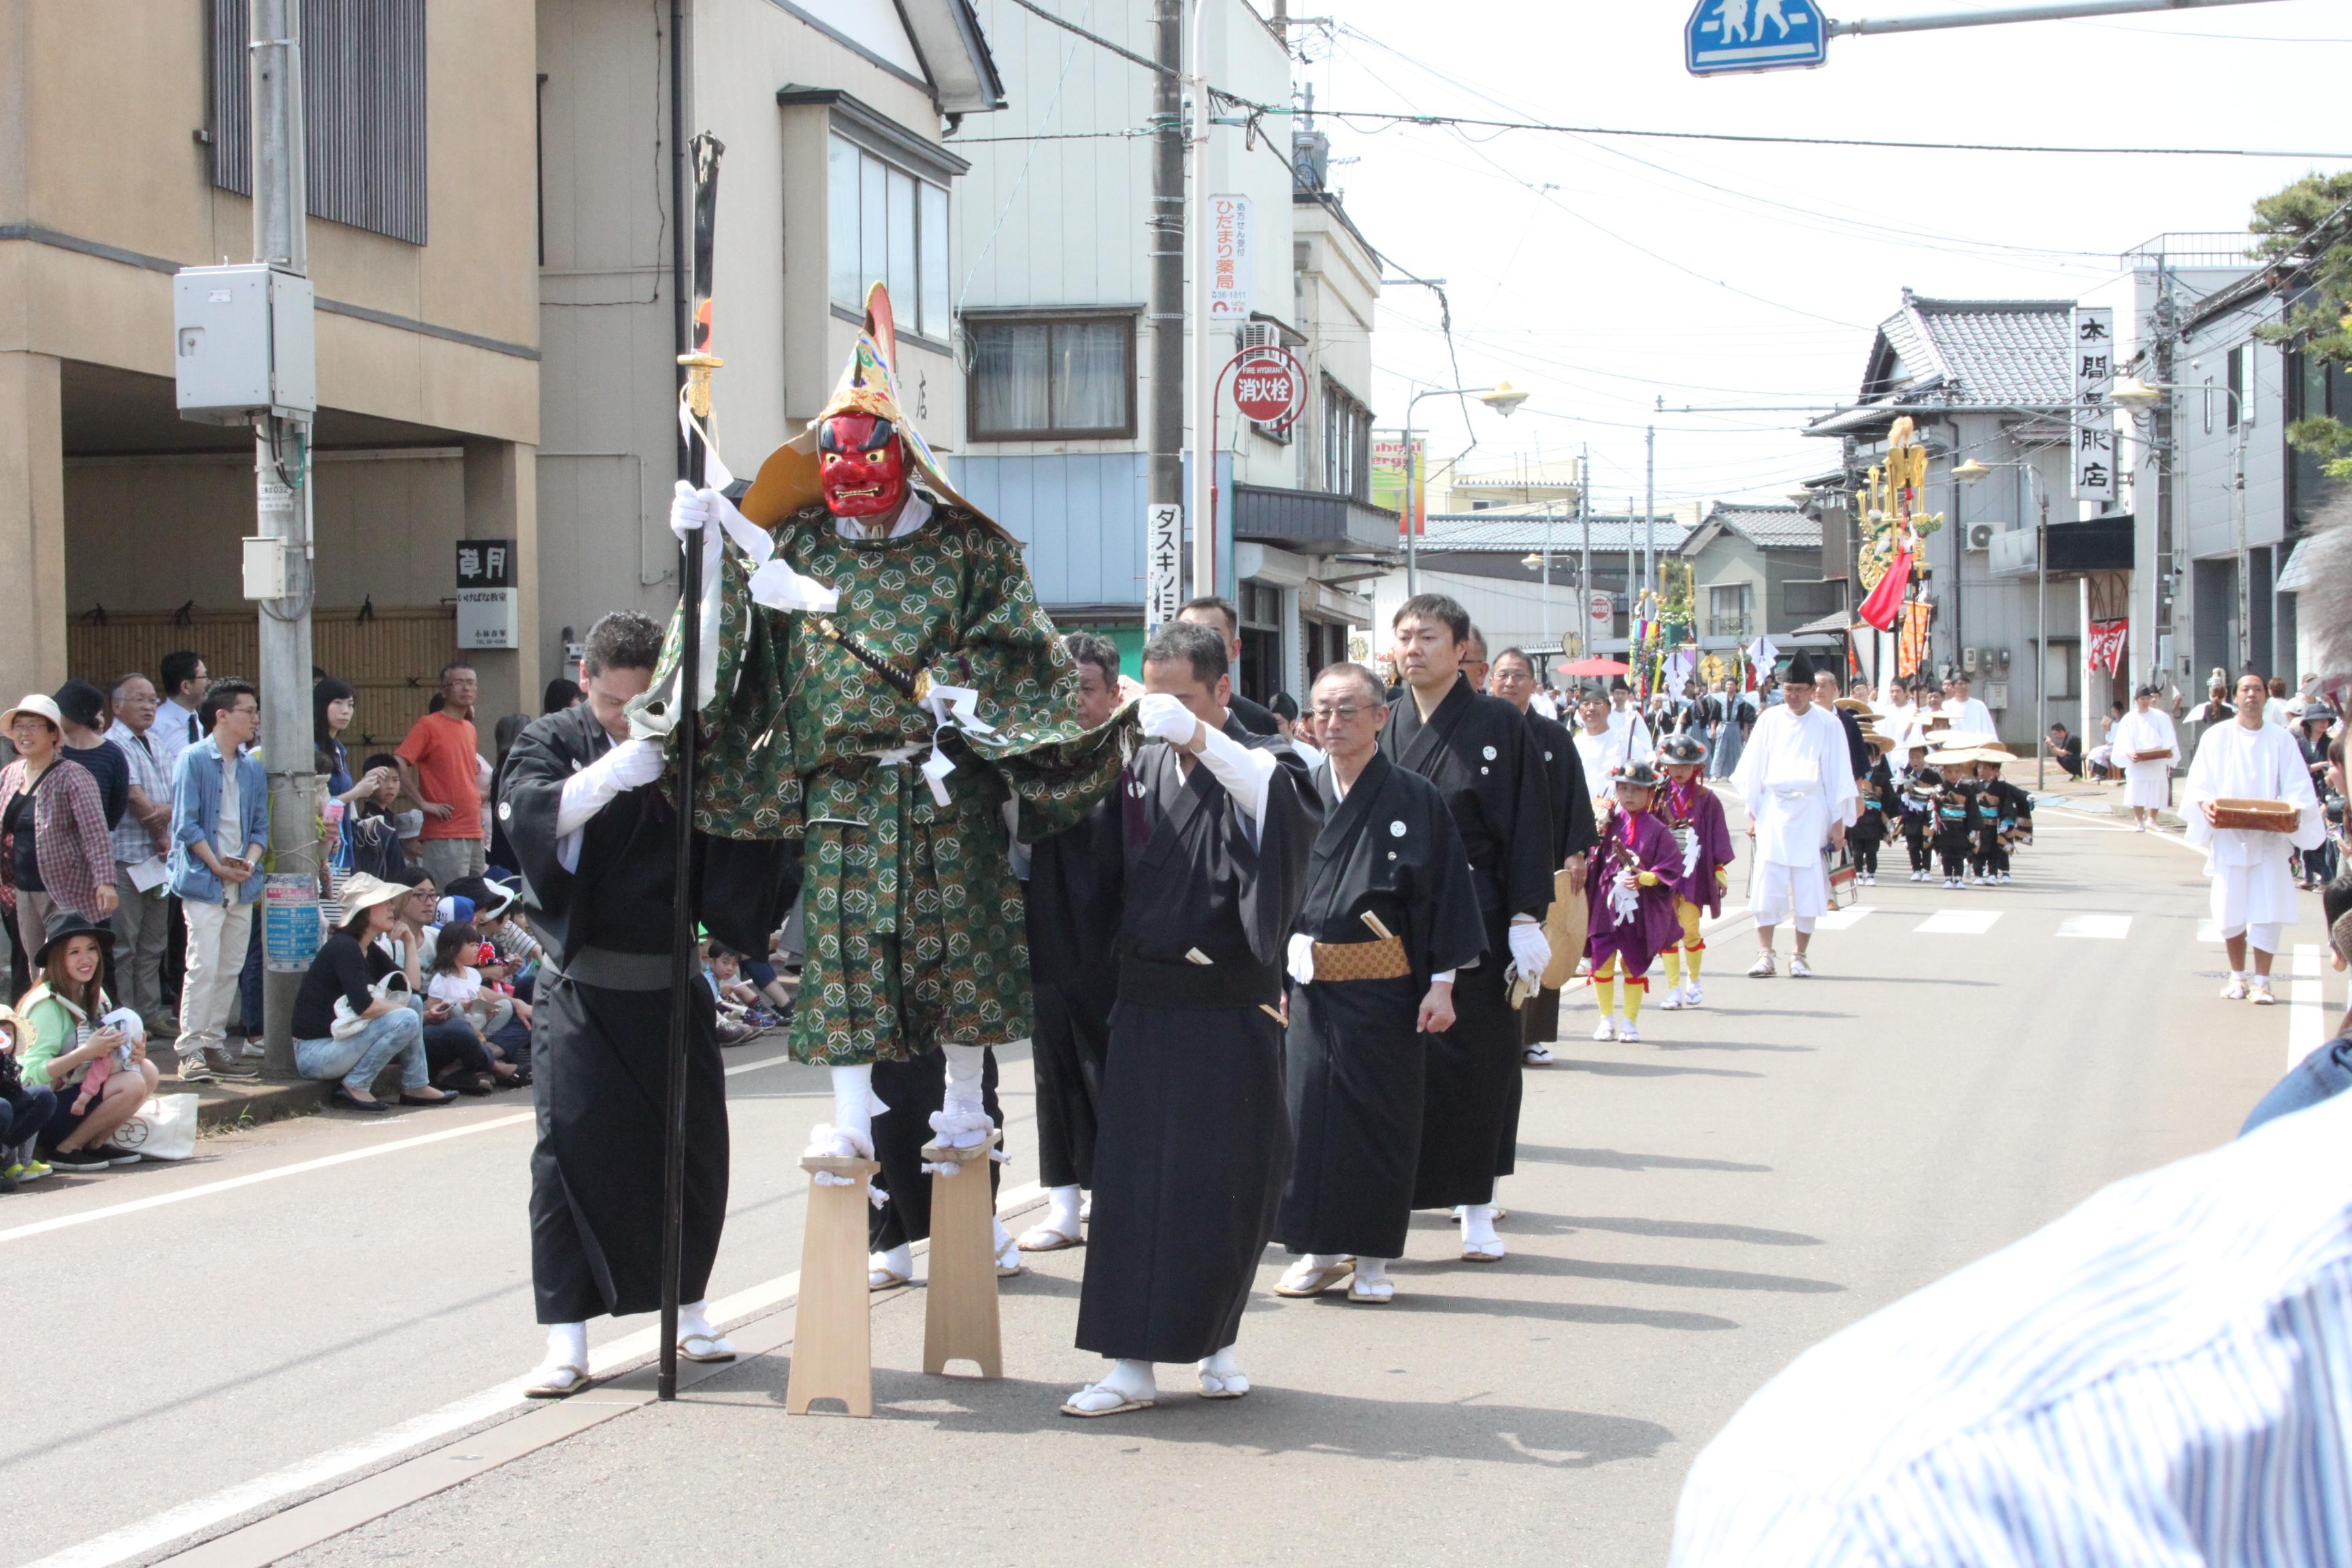 http://tsubamesanjo-jc.or.jp/2015/wp-content/uploads/2015/05/IMG_8810.jpg